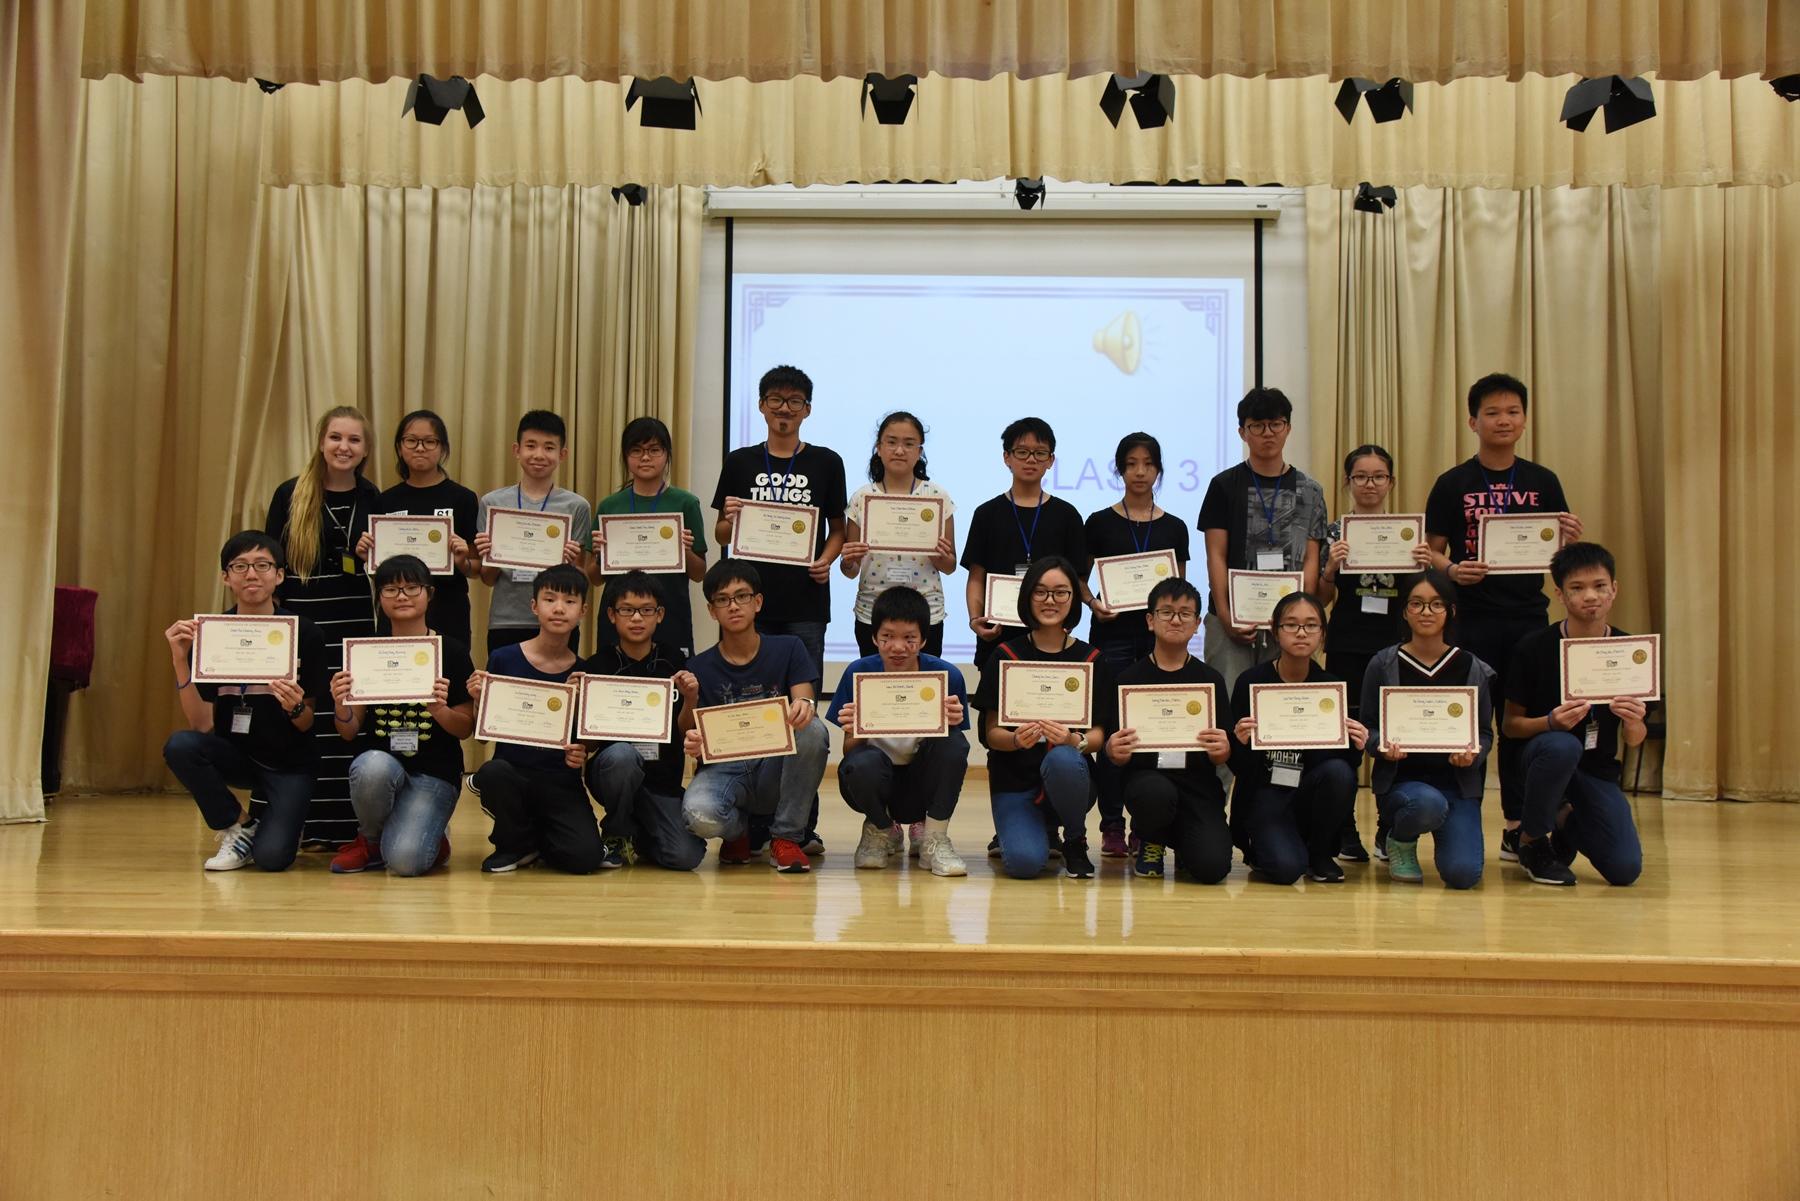 http://www.npc.edu.hk/sites/default/files/dsc_0268.jpg